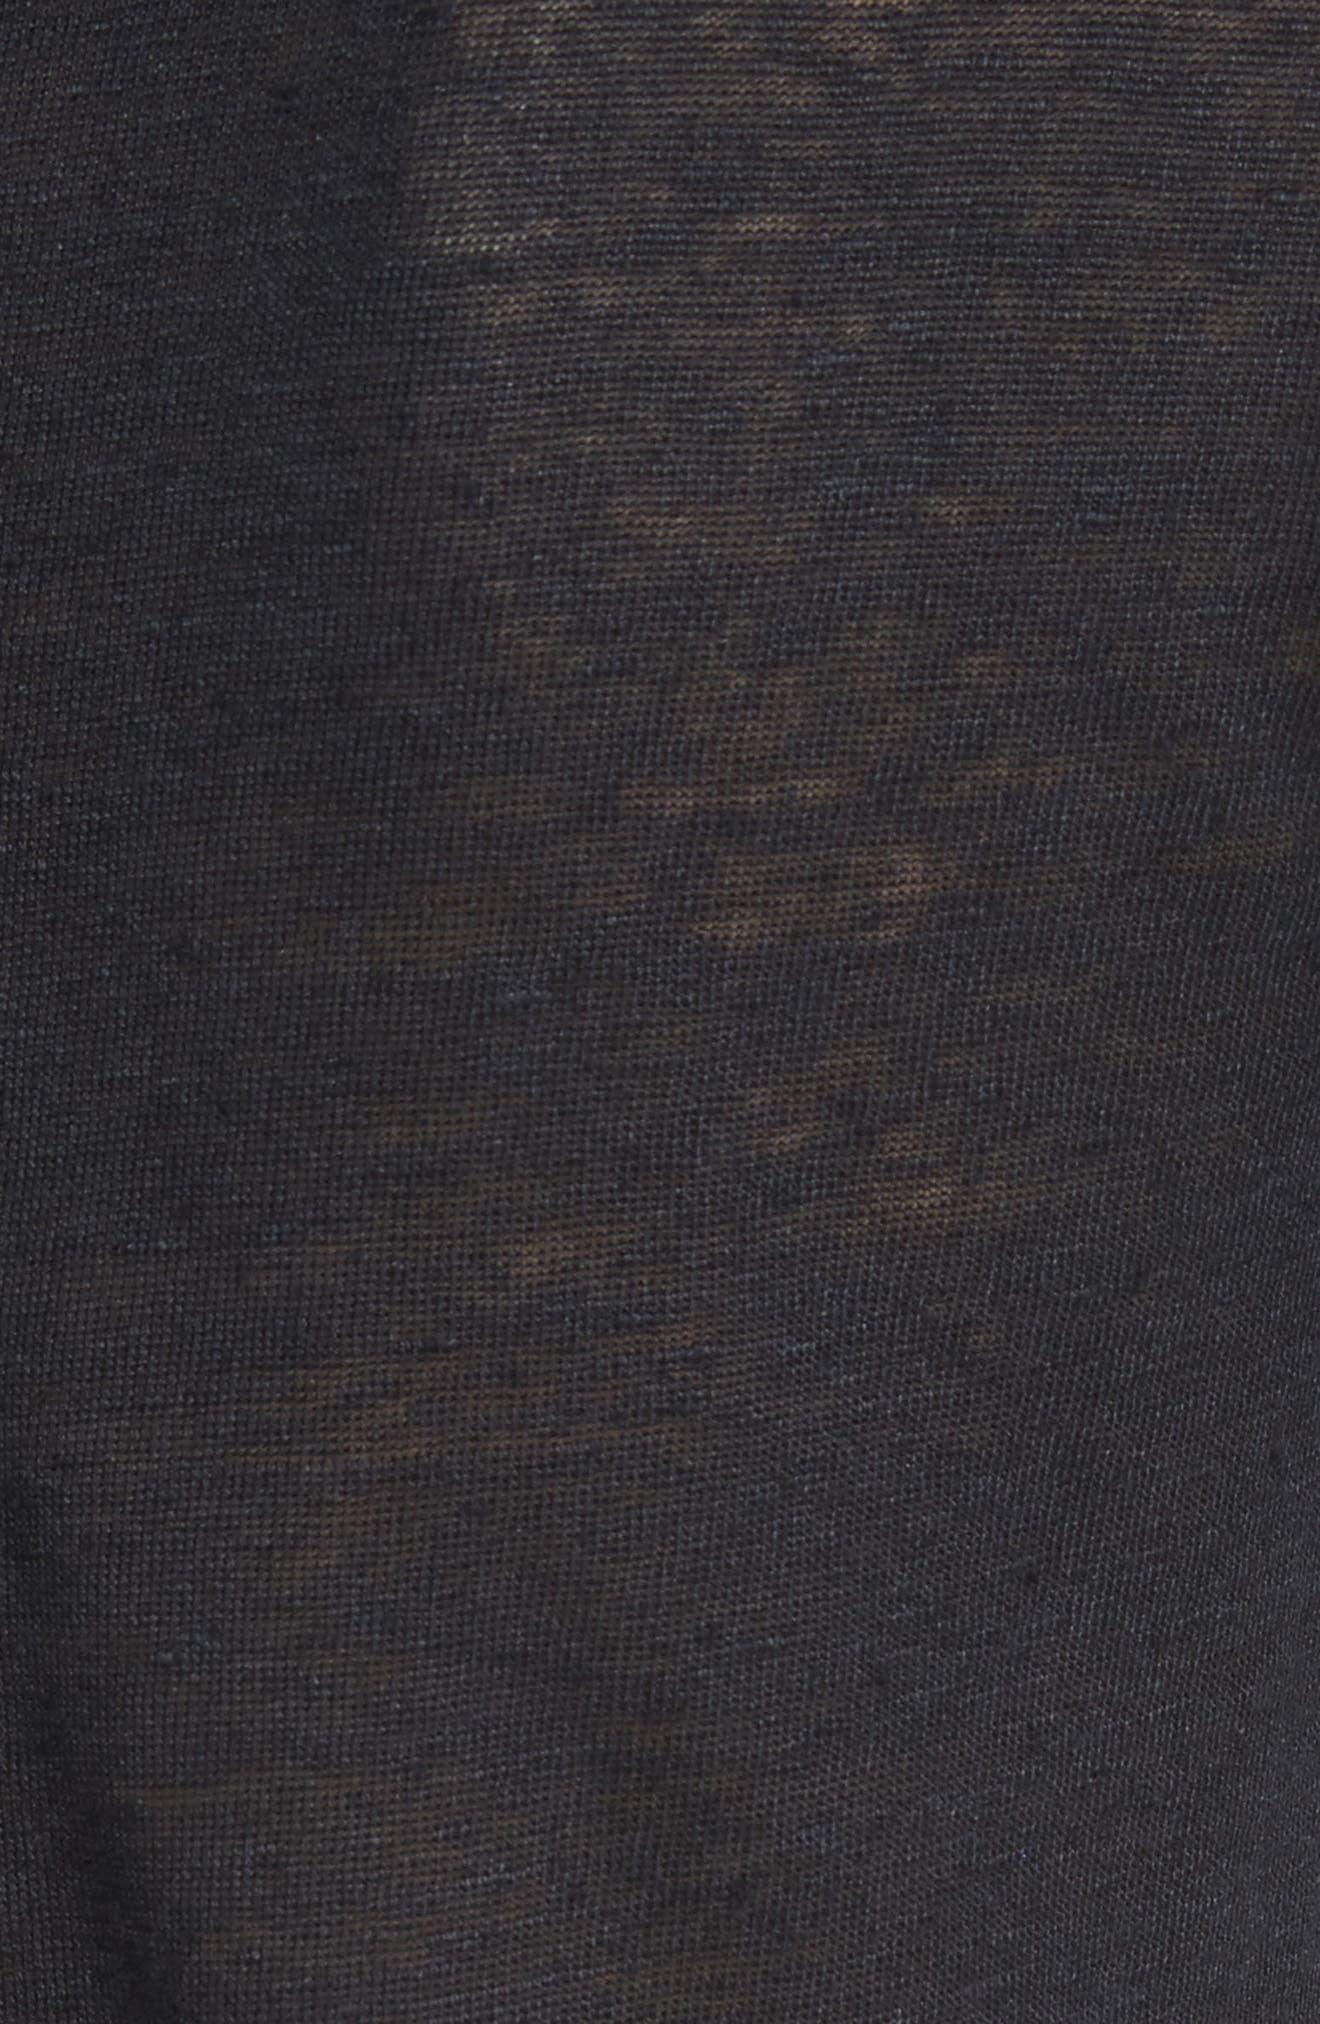 Serrano Cold Shoulder Tee,                             Alternate thumbnail 5, color,                             Navy